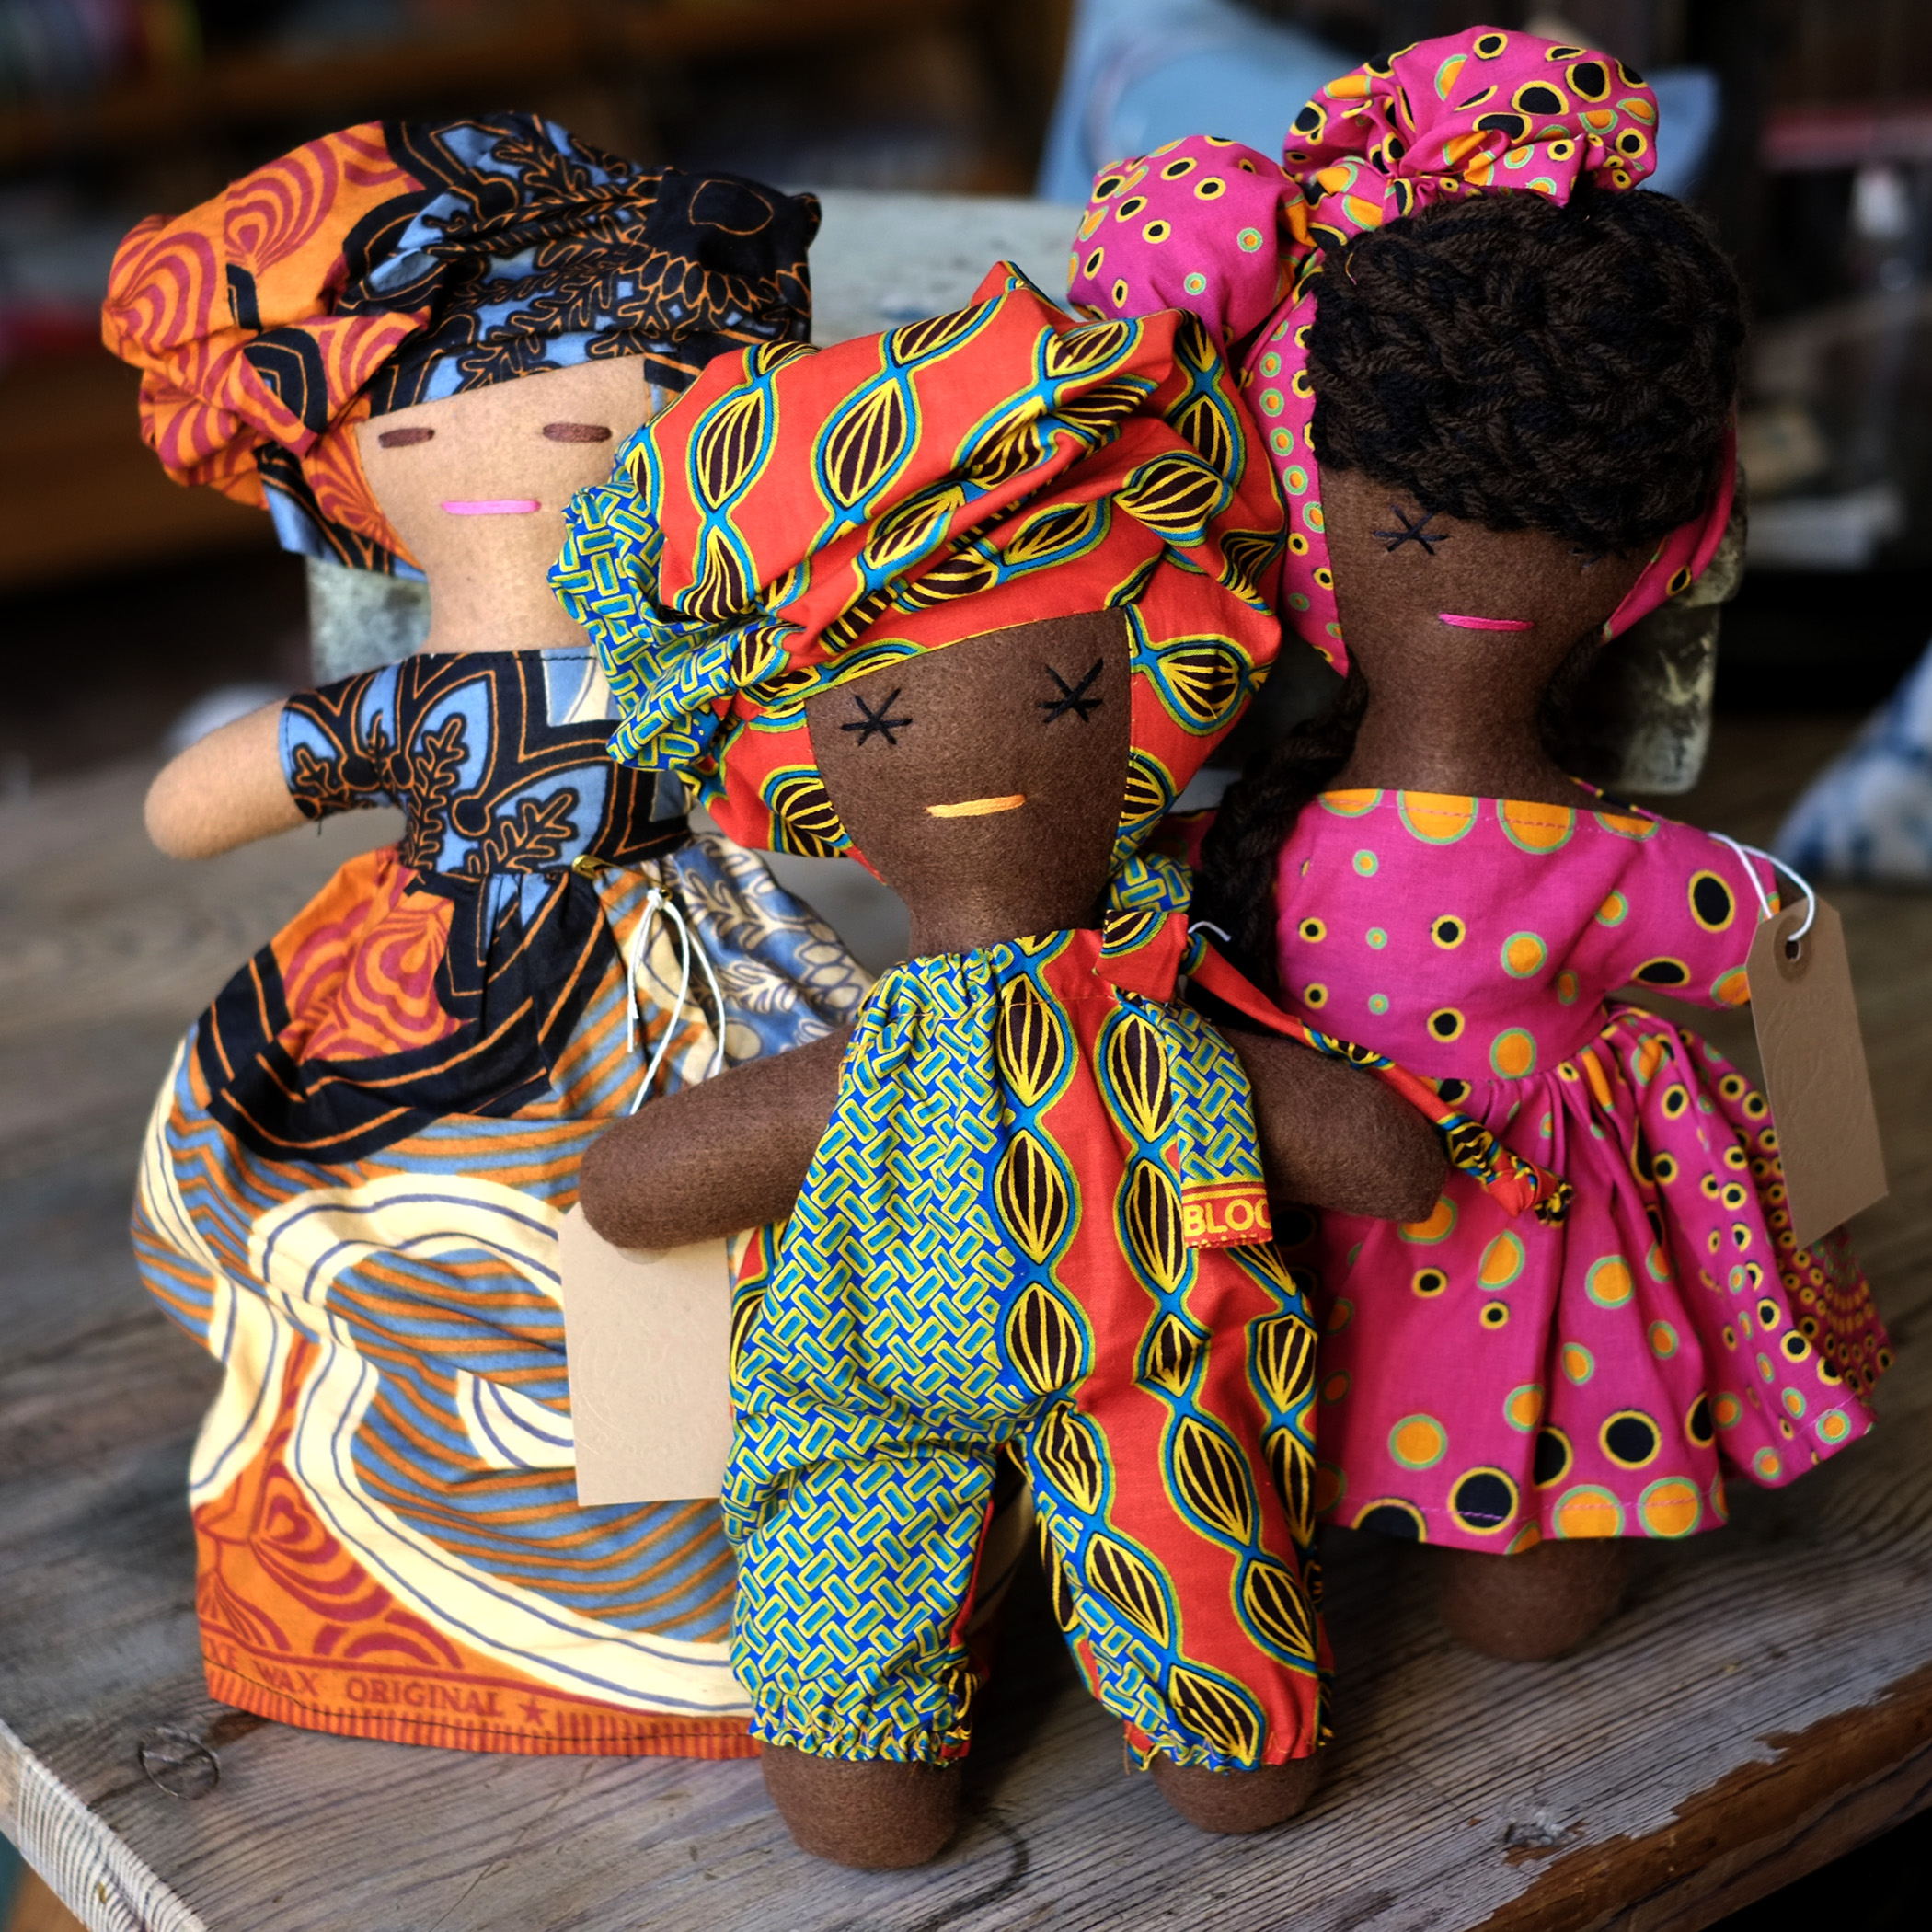 Dolls by Verona C